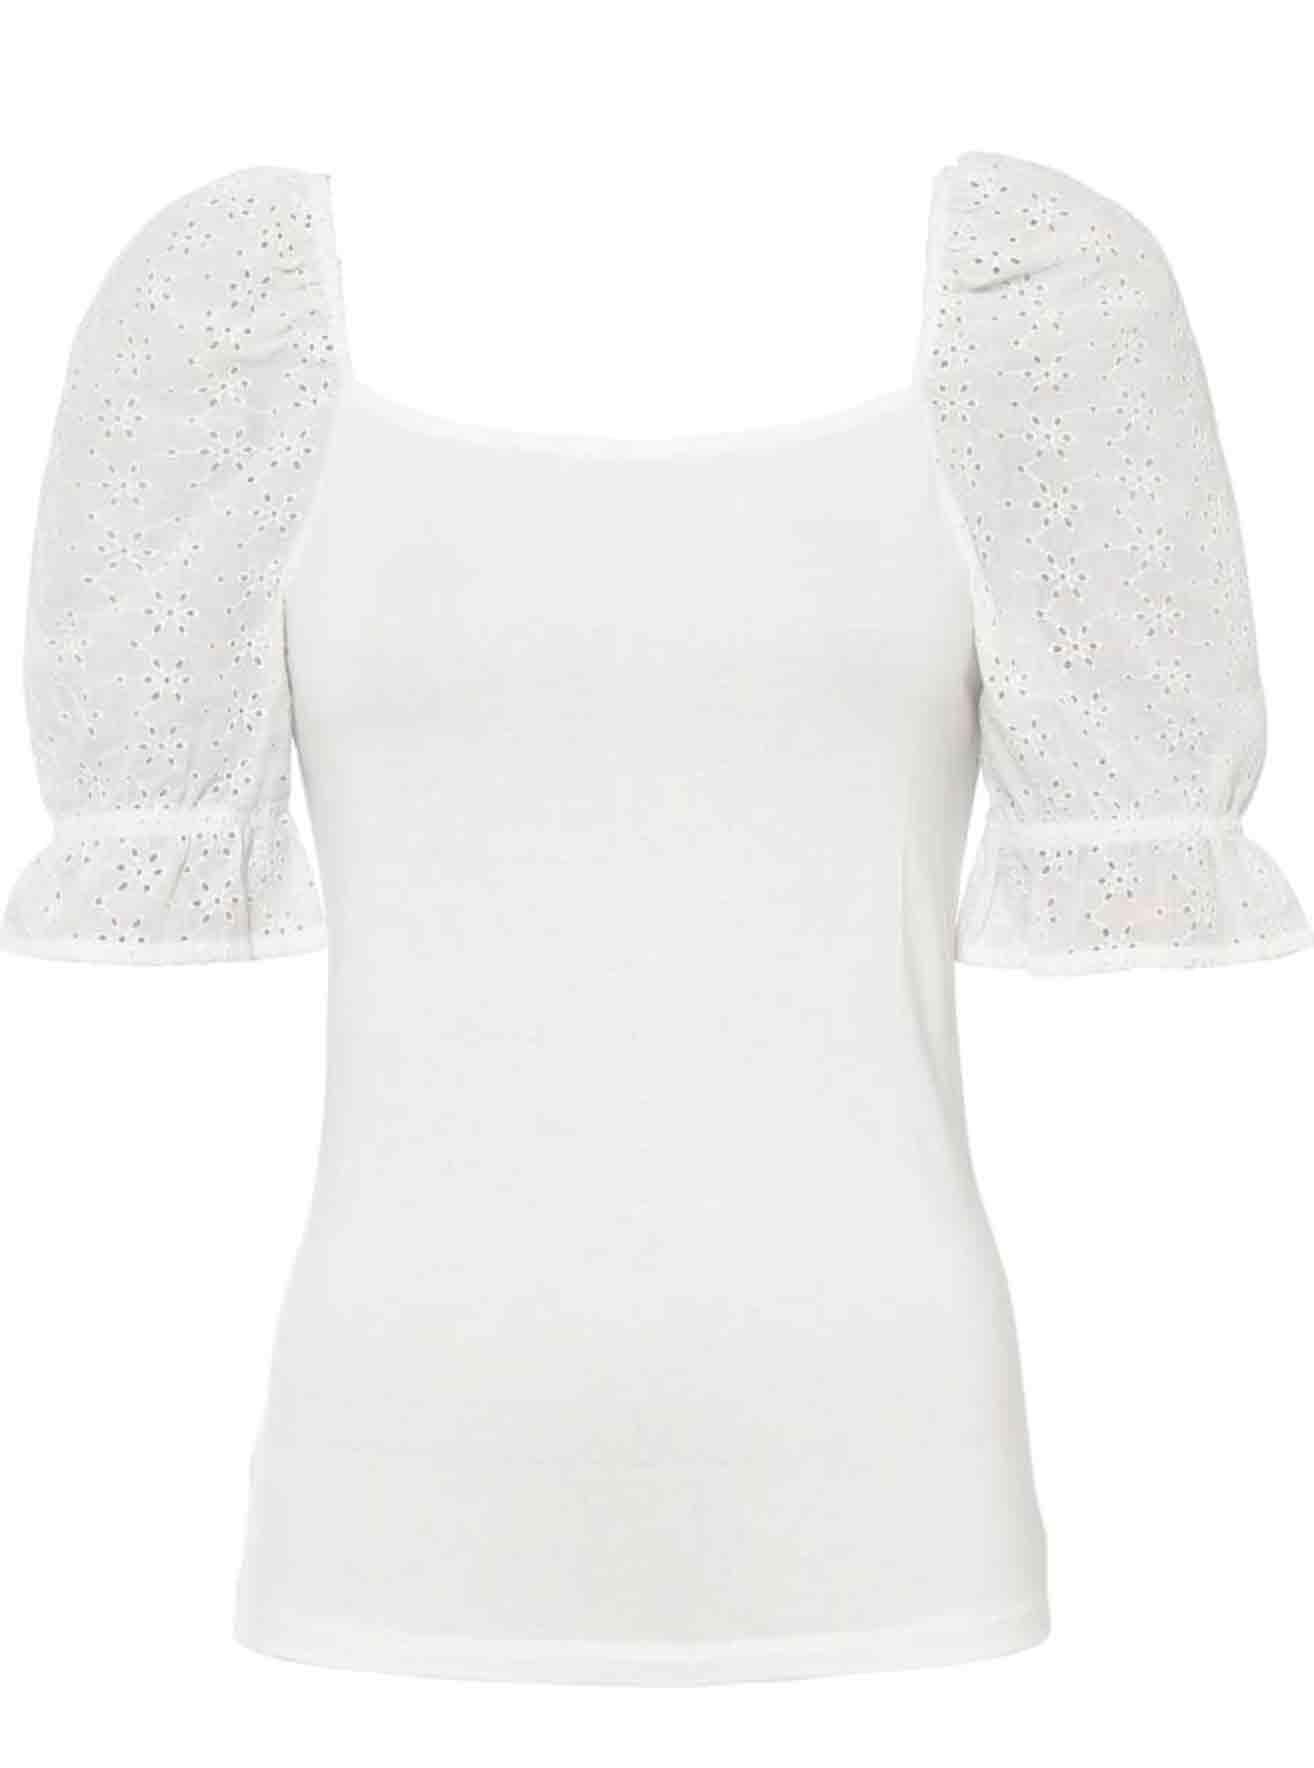 https://www.letilor.com/wp-content/uploads/2021/05/blouseblanche.jpg